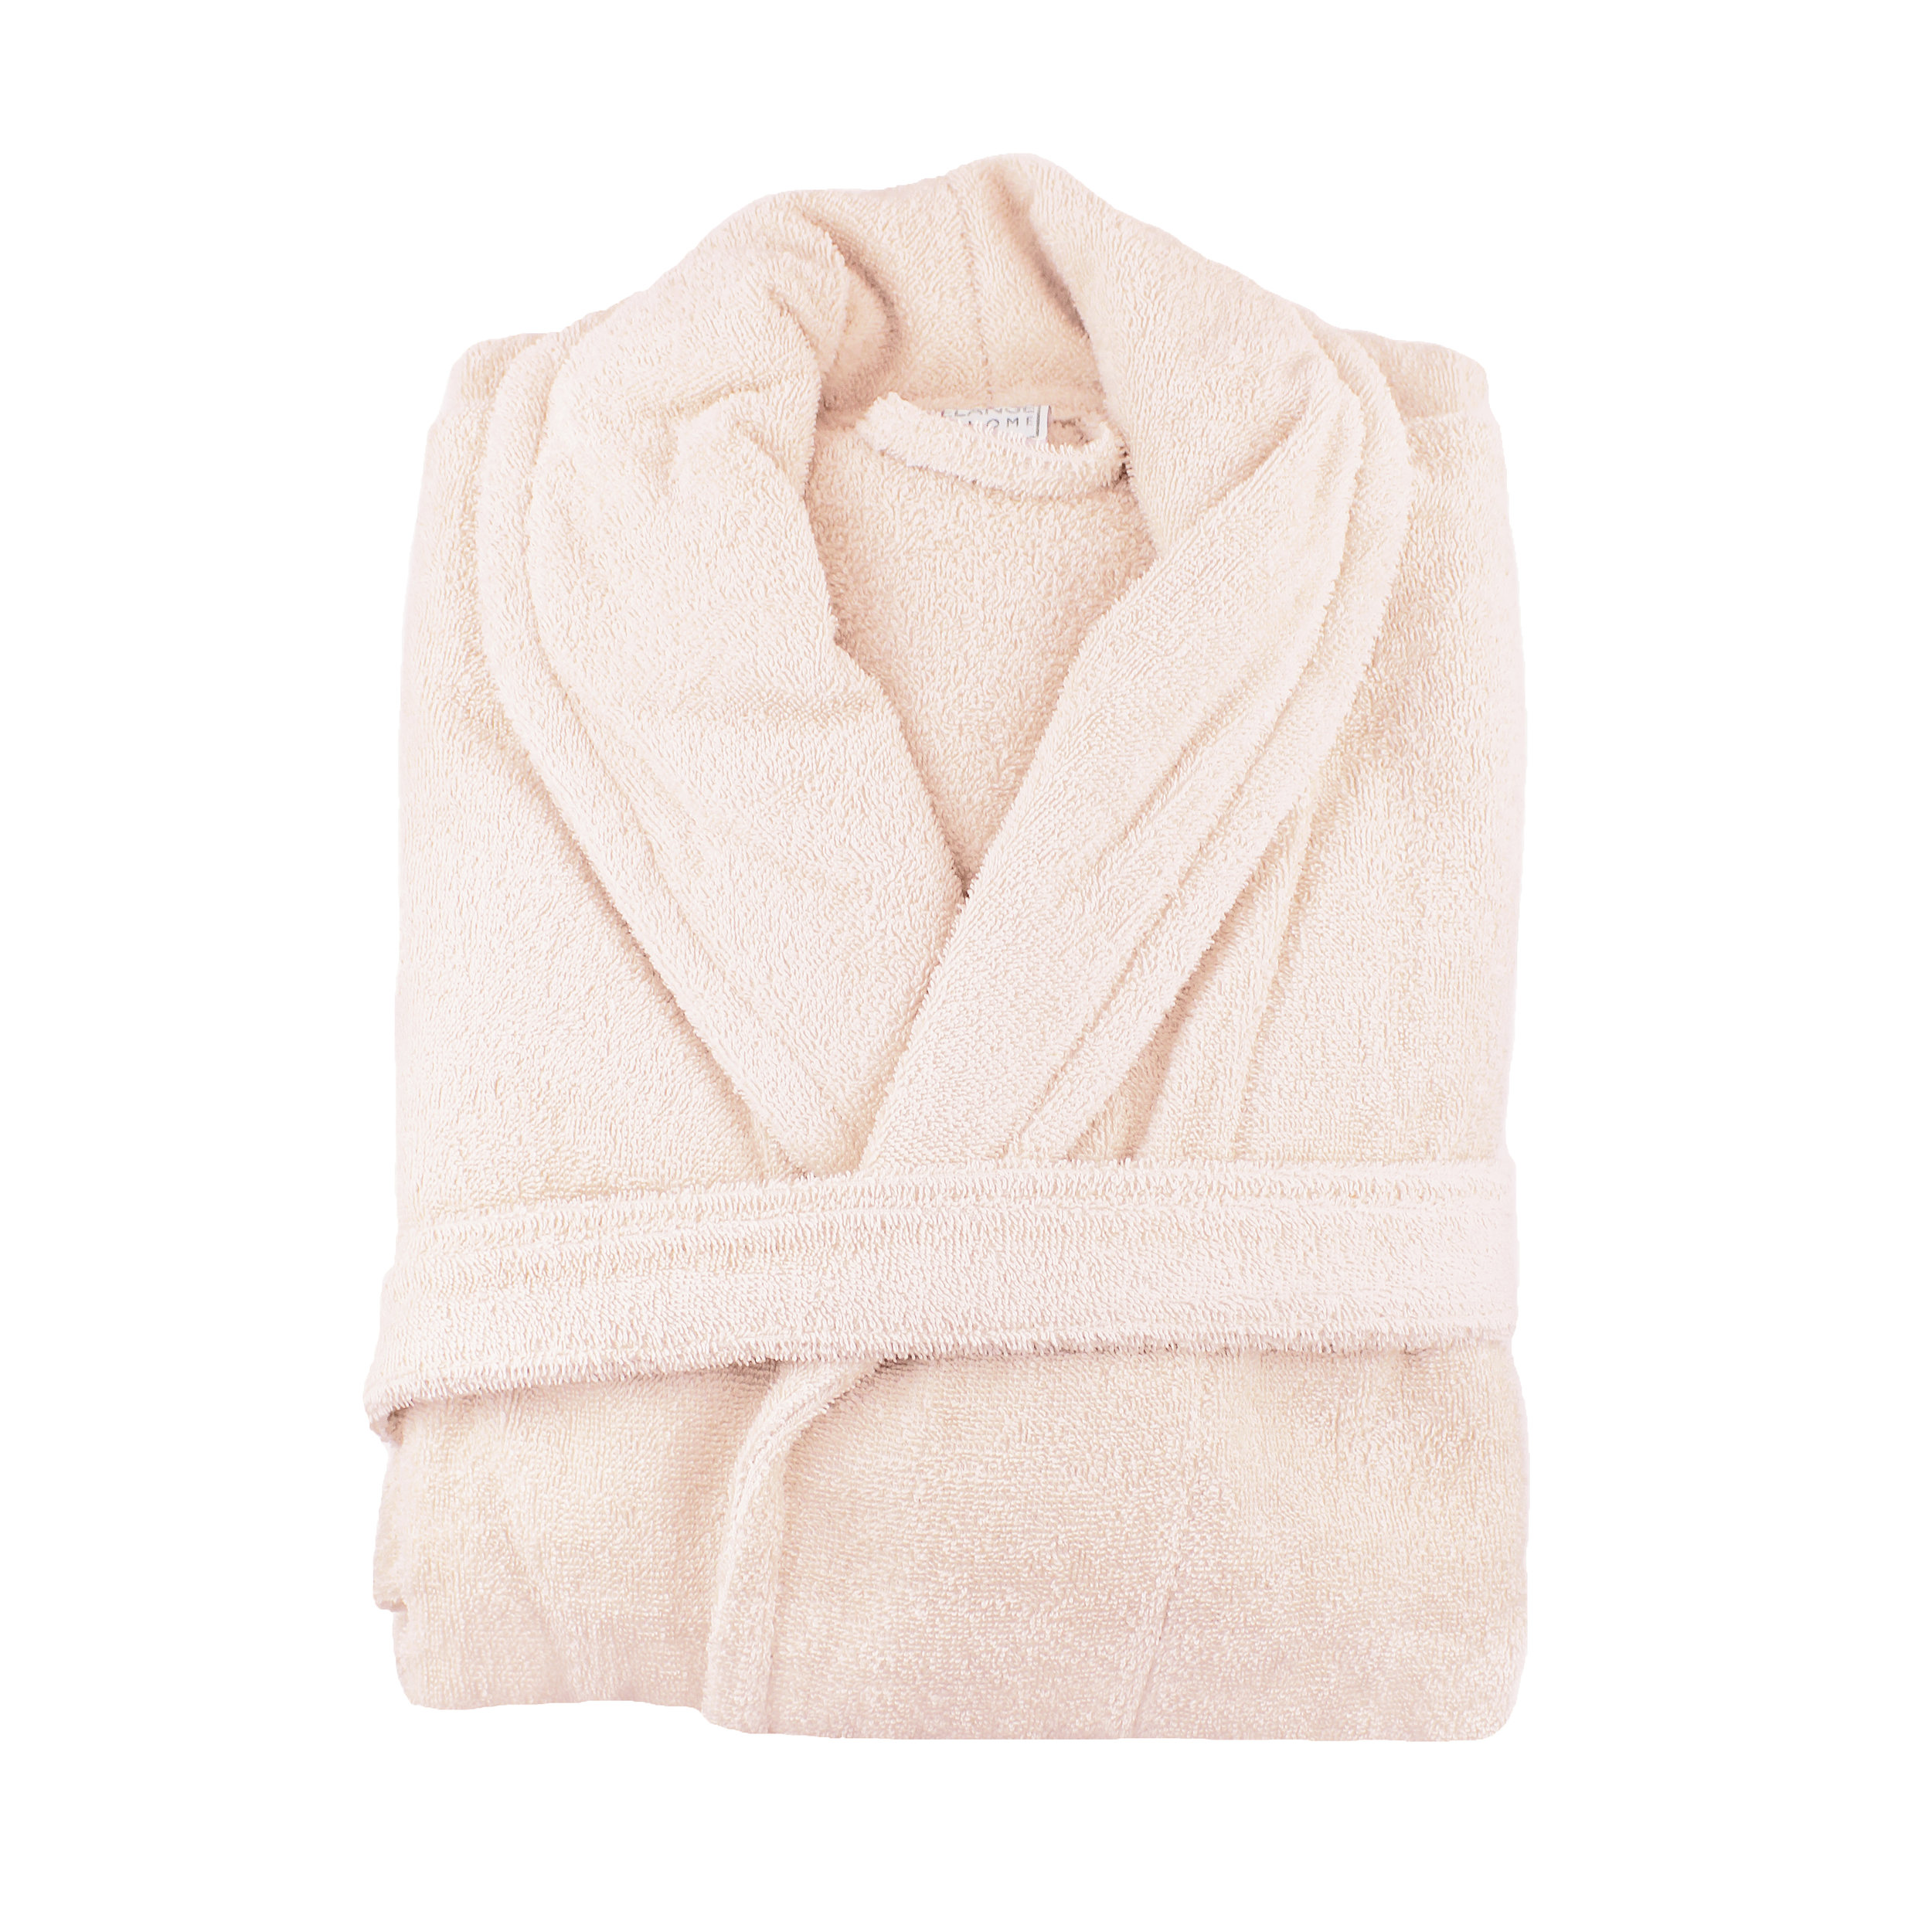 Turkish Bath Robe_Smokin Pink.jpg